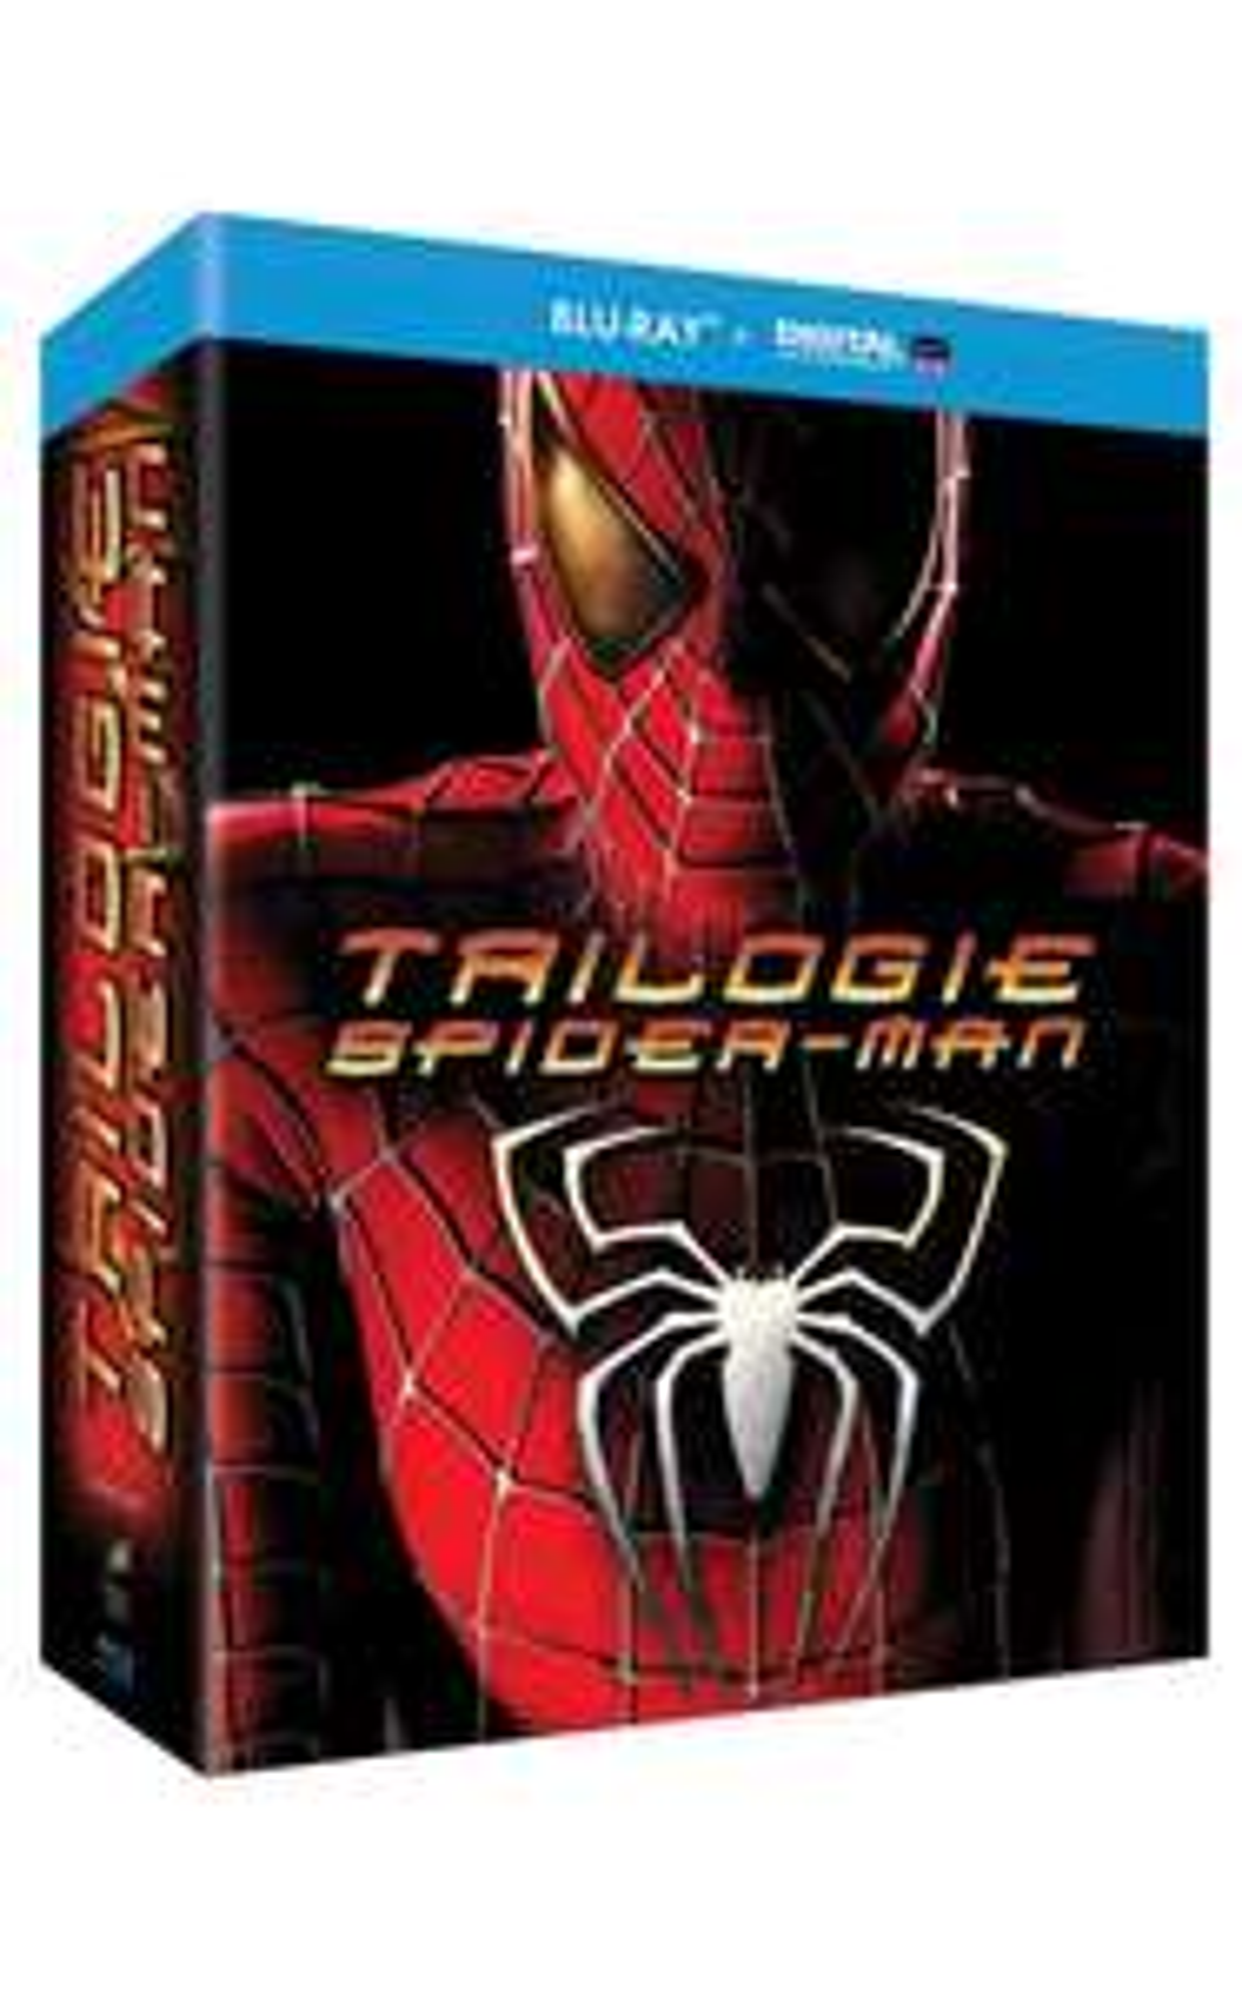 Pack trilogie Spiderman Blu-ray